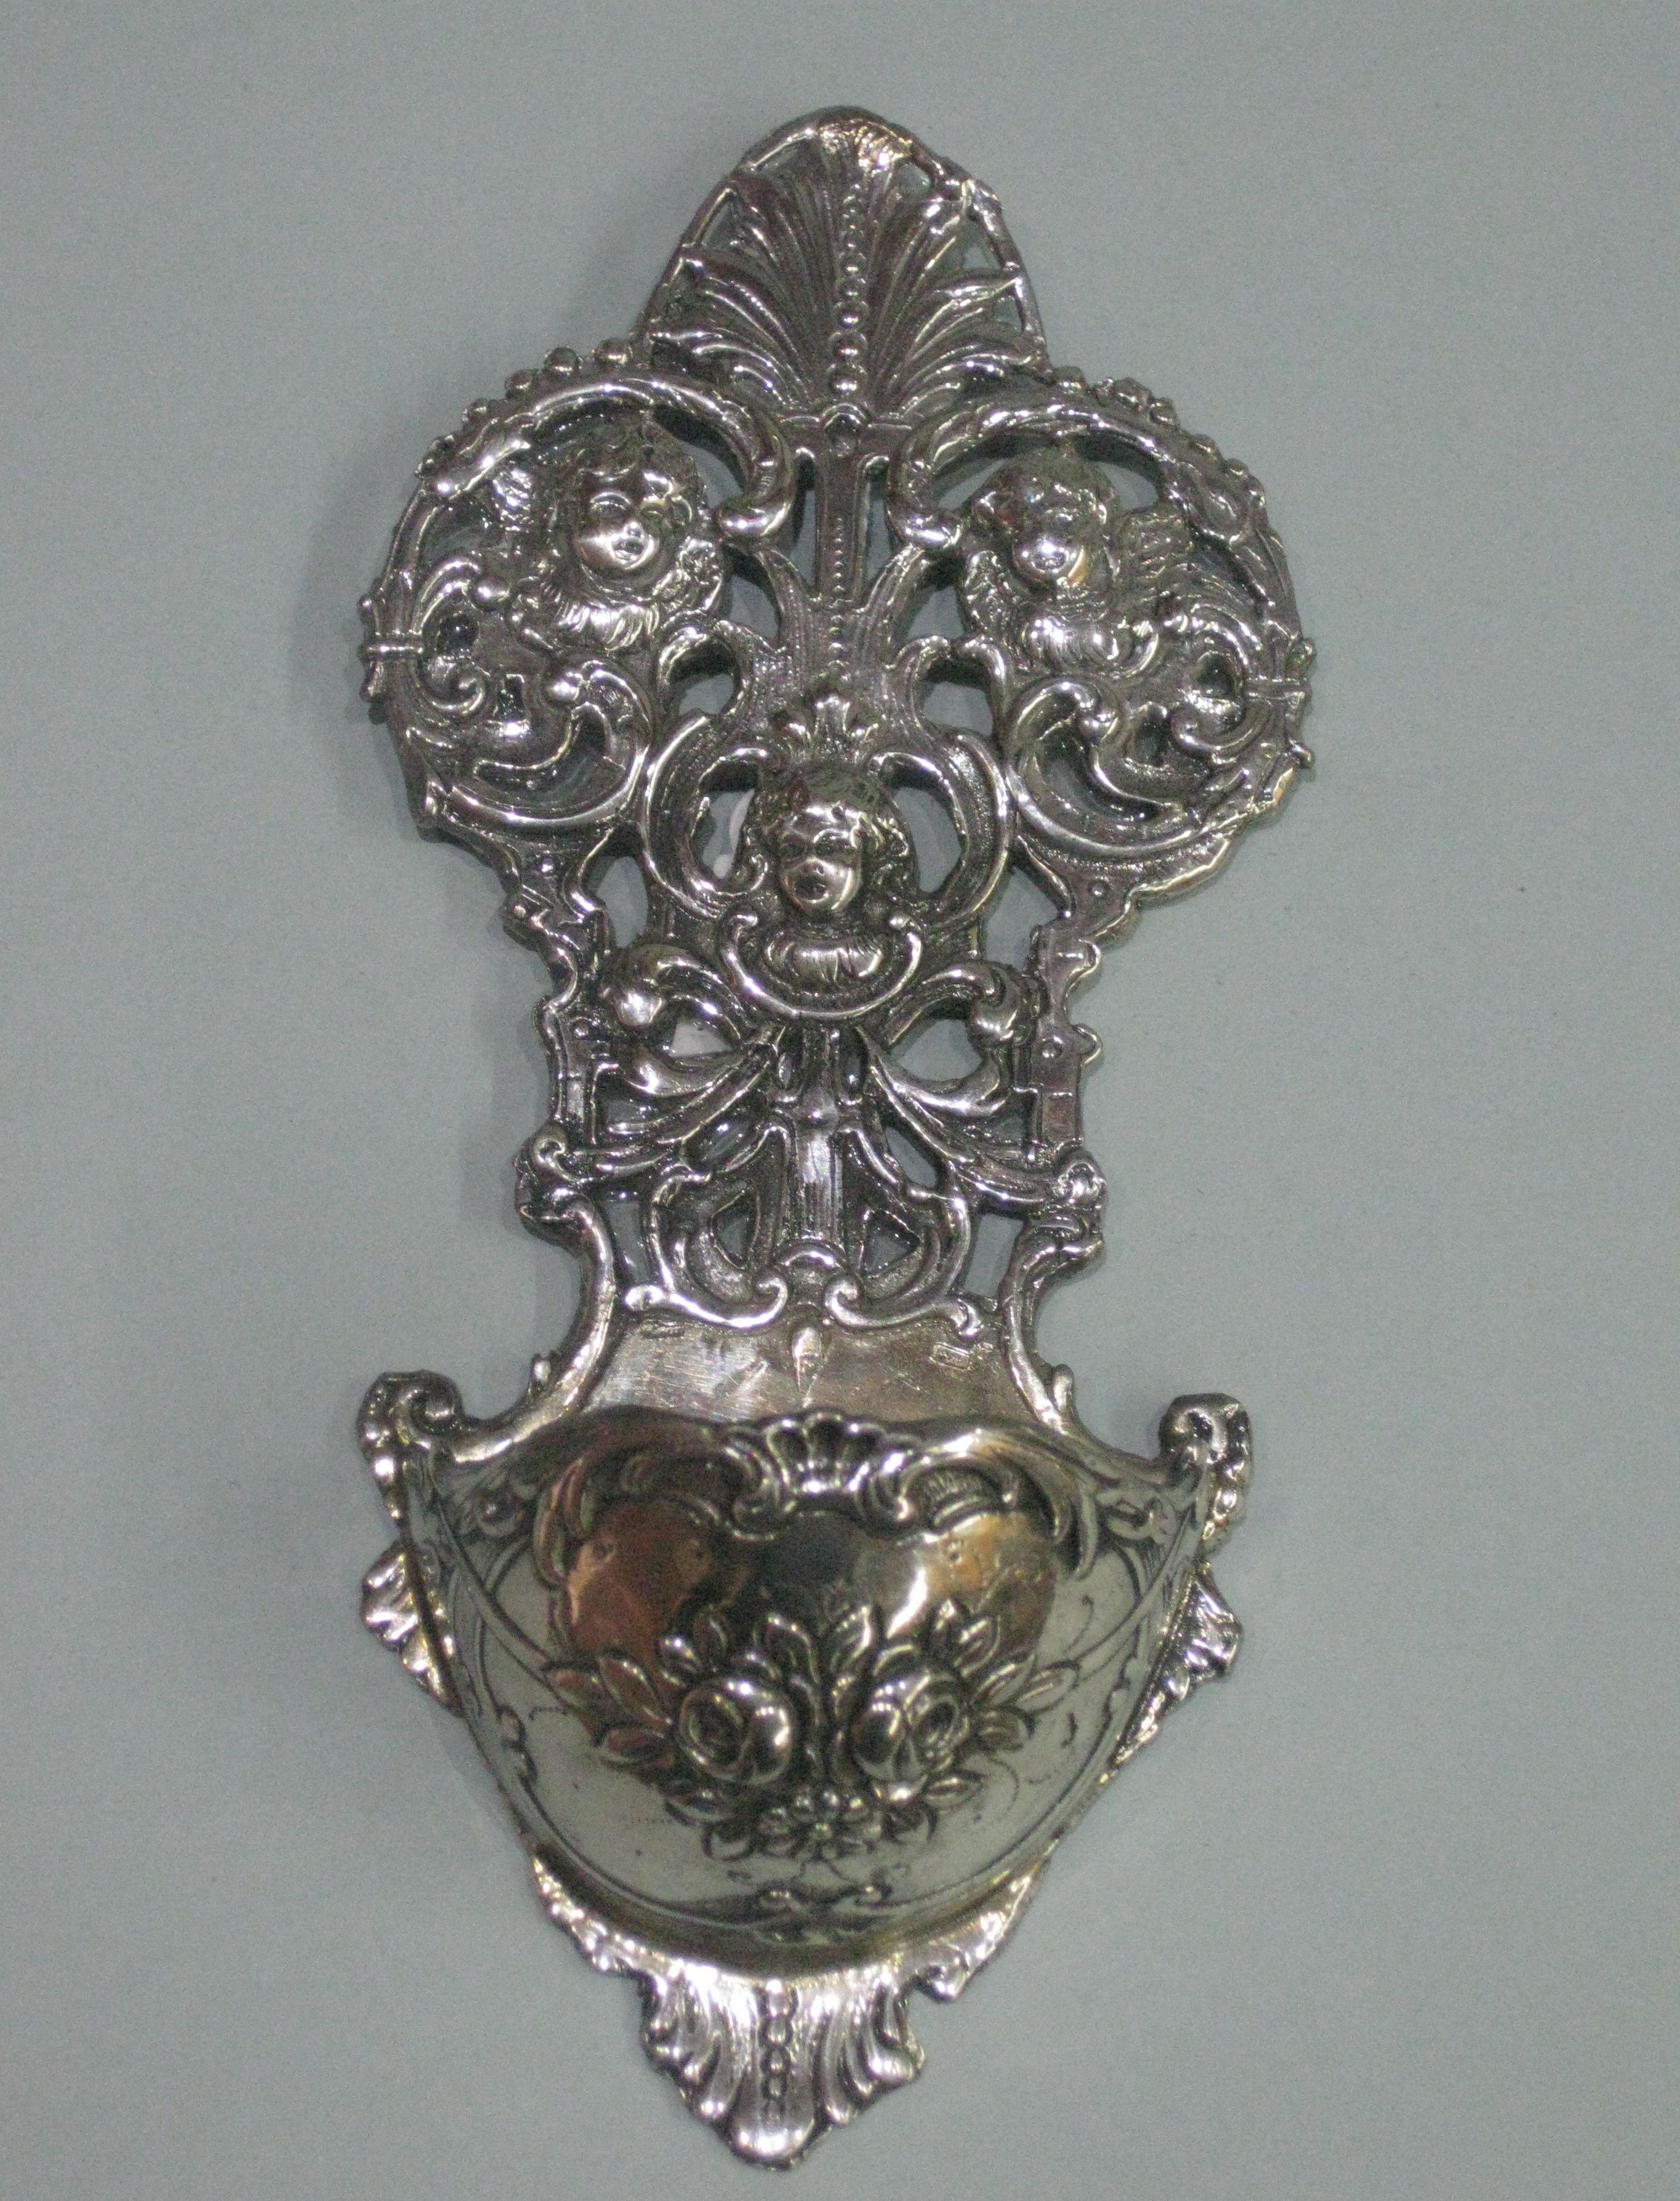 BENDITERA ANGELITOS: Catalogo de plata de Vera Orfebre